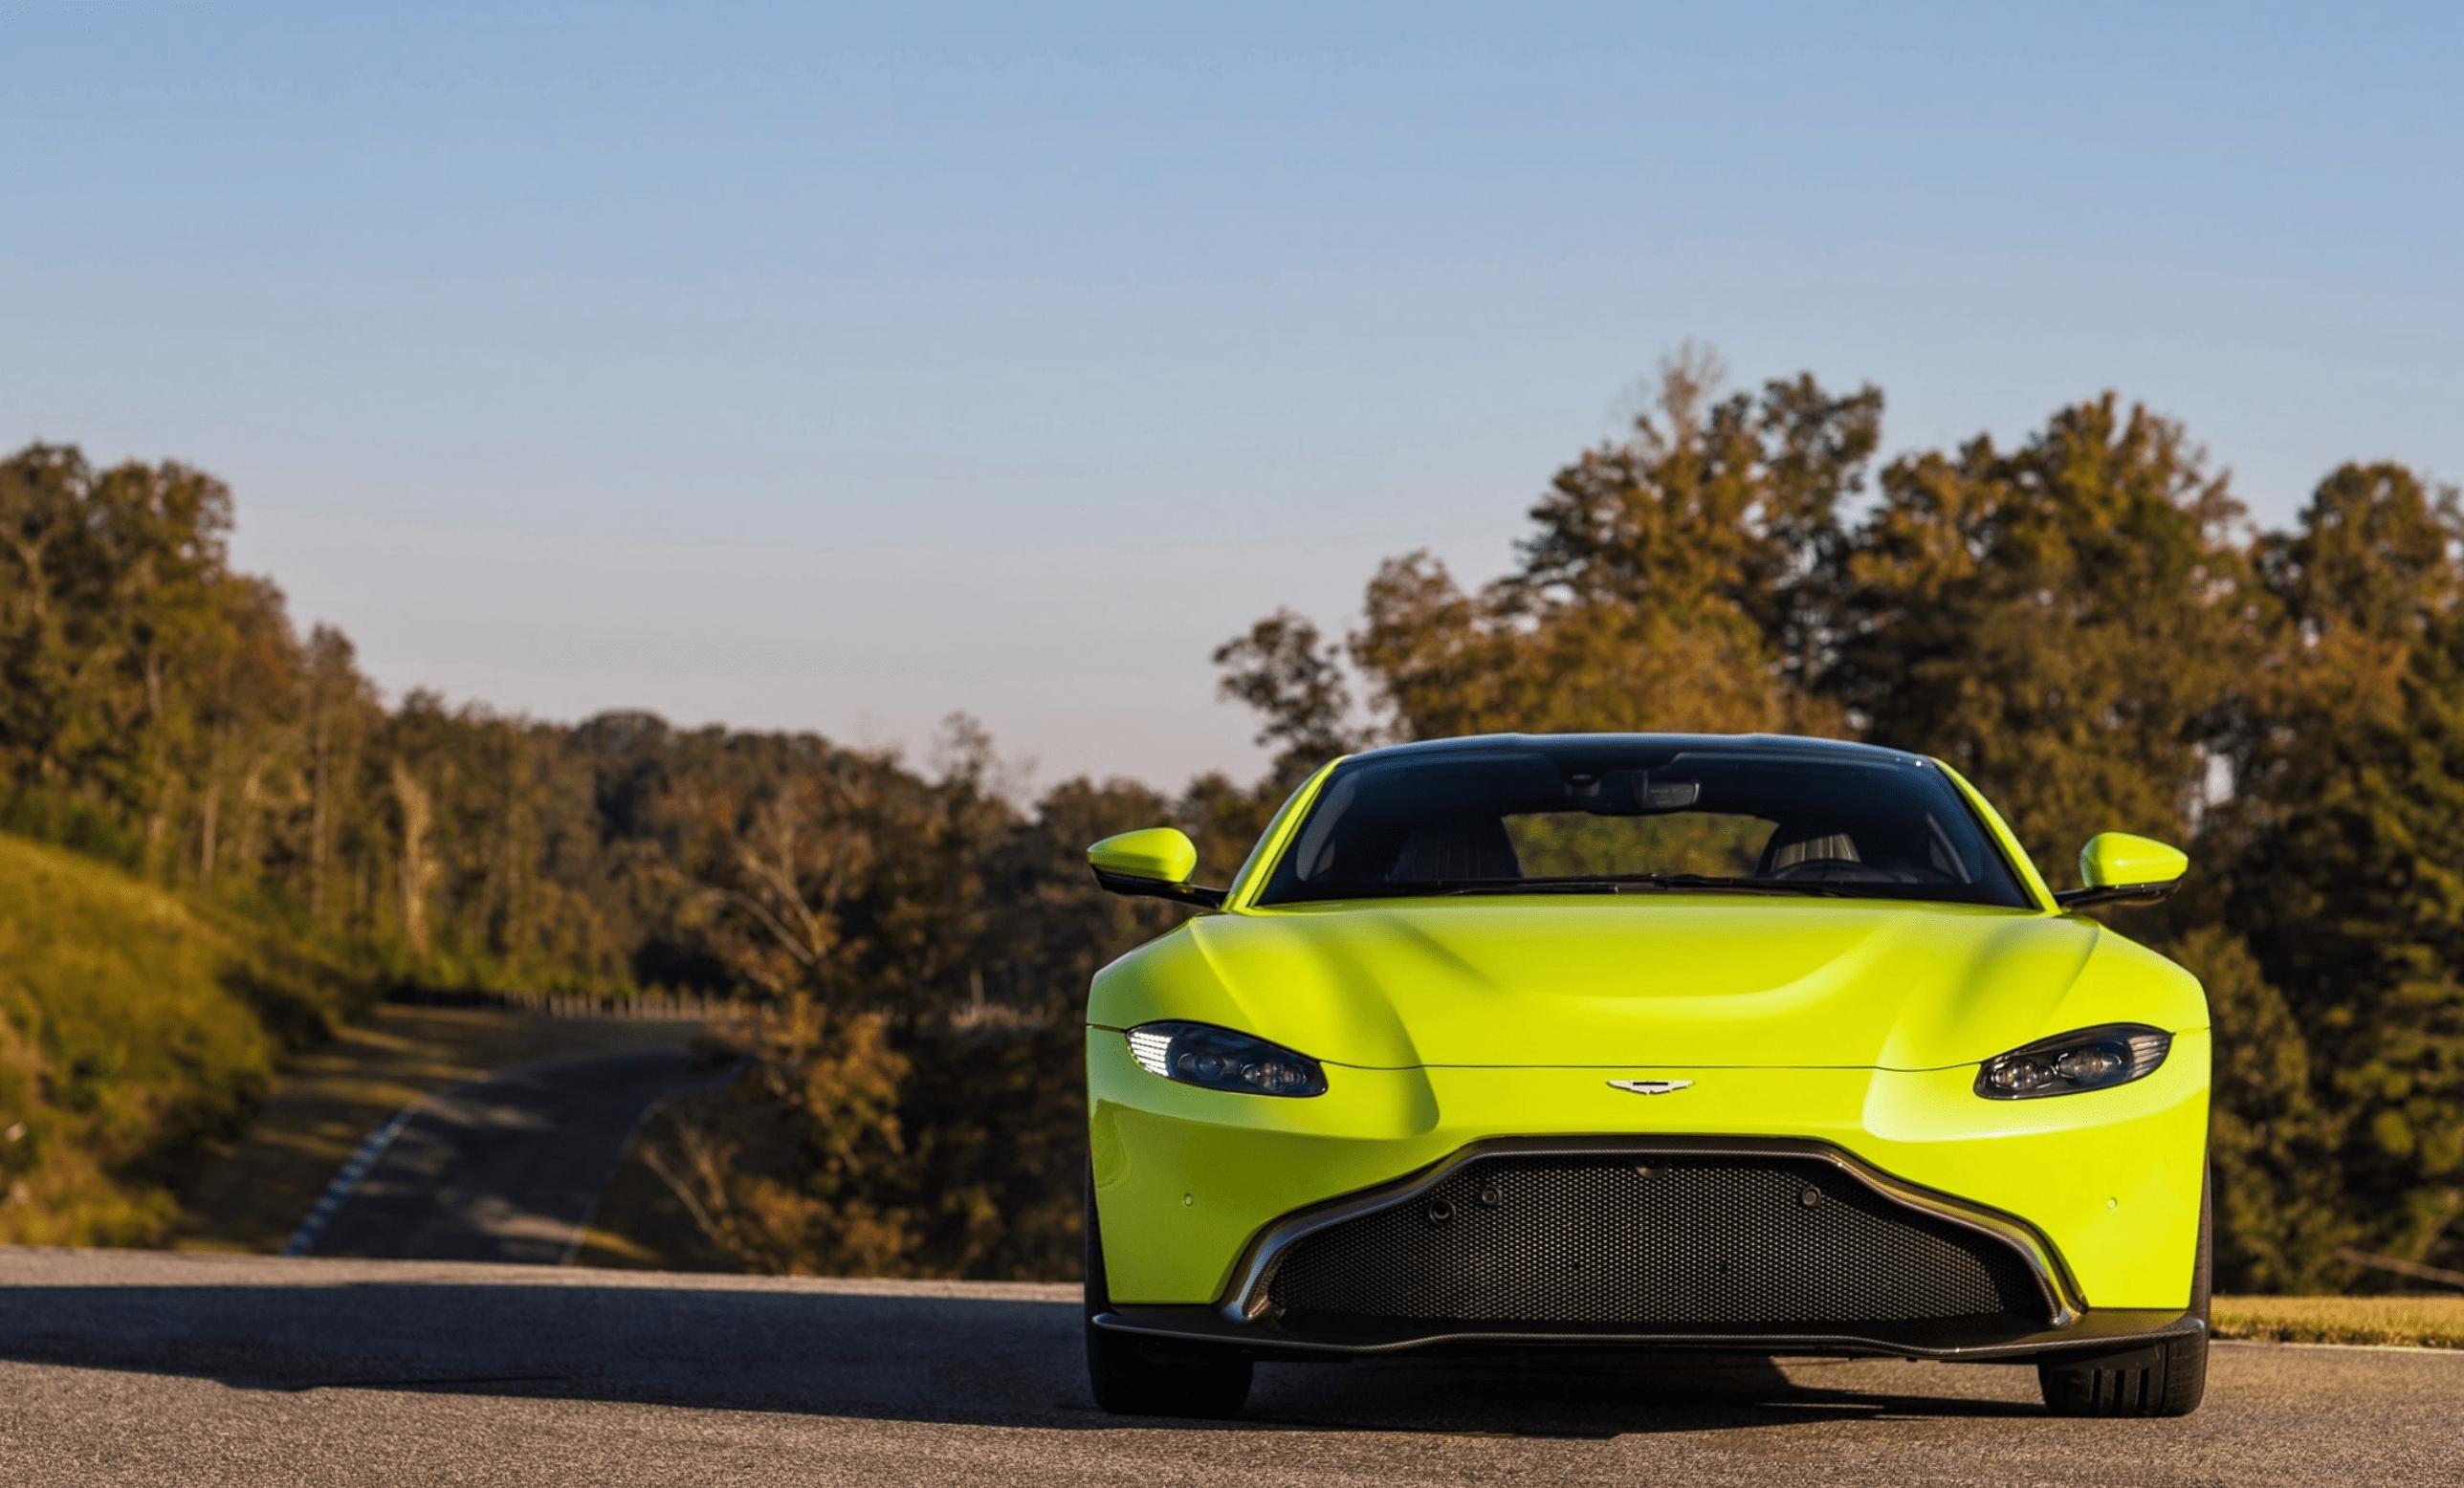 Leasing a Aston Martin